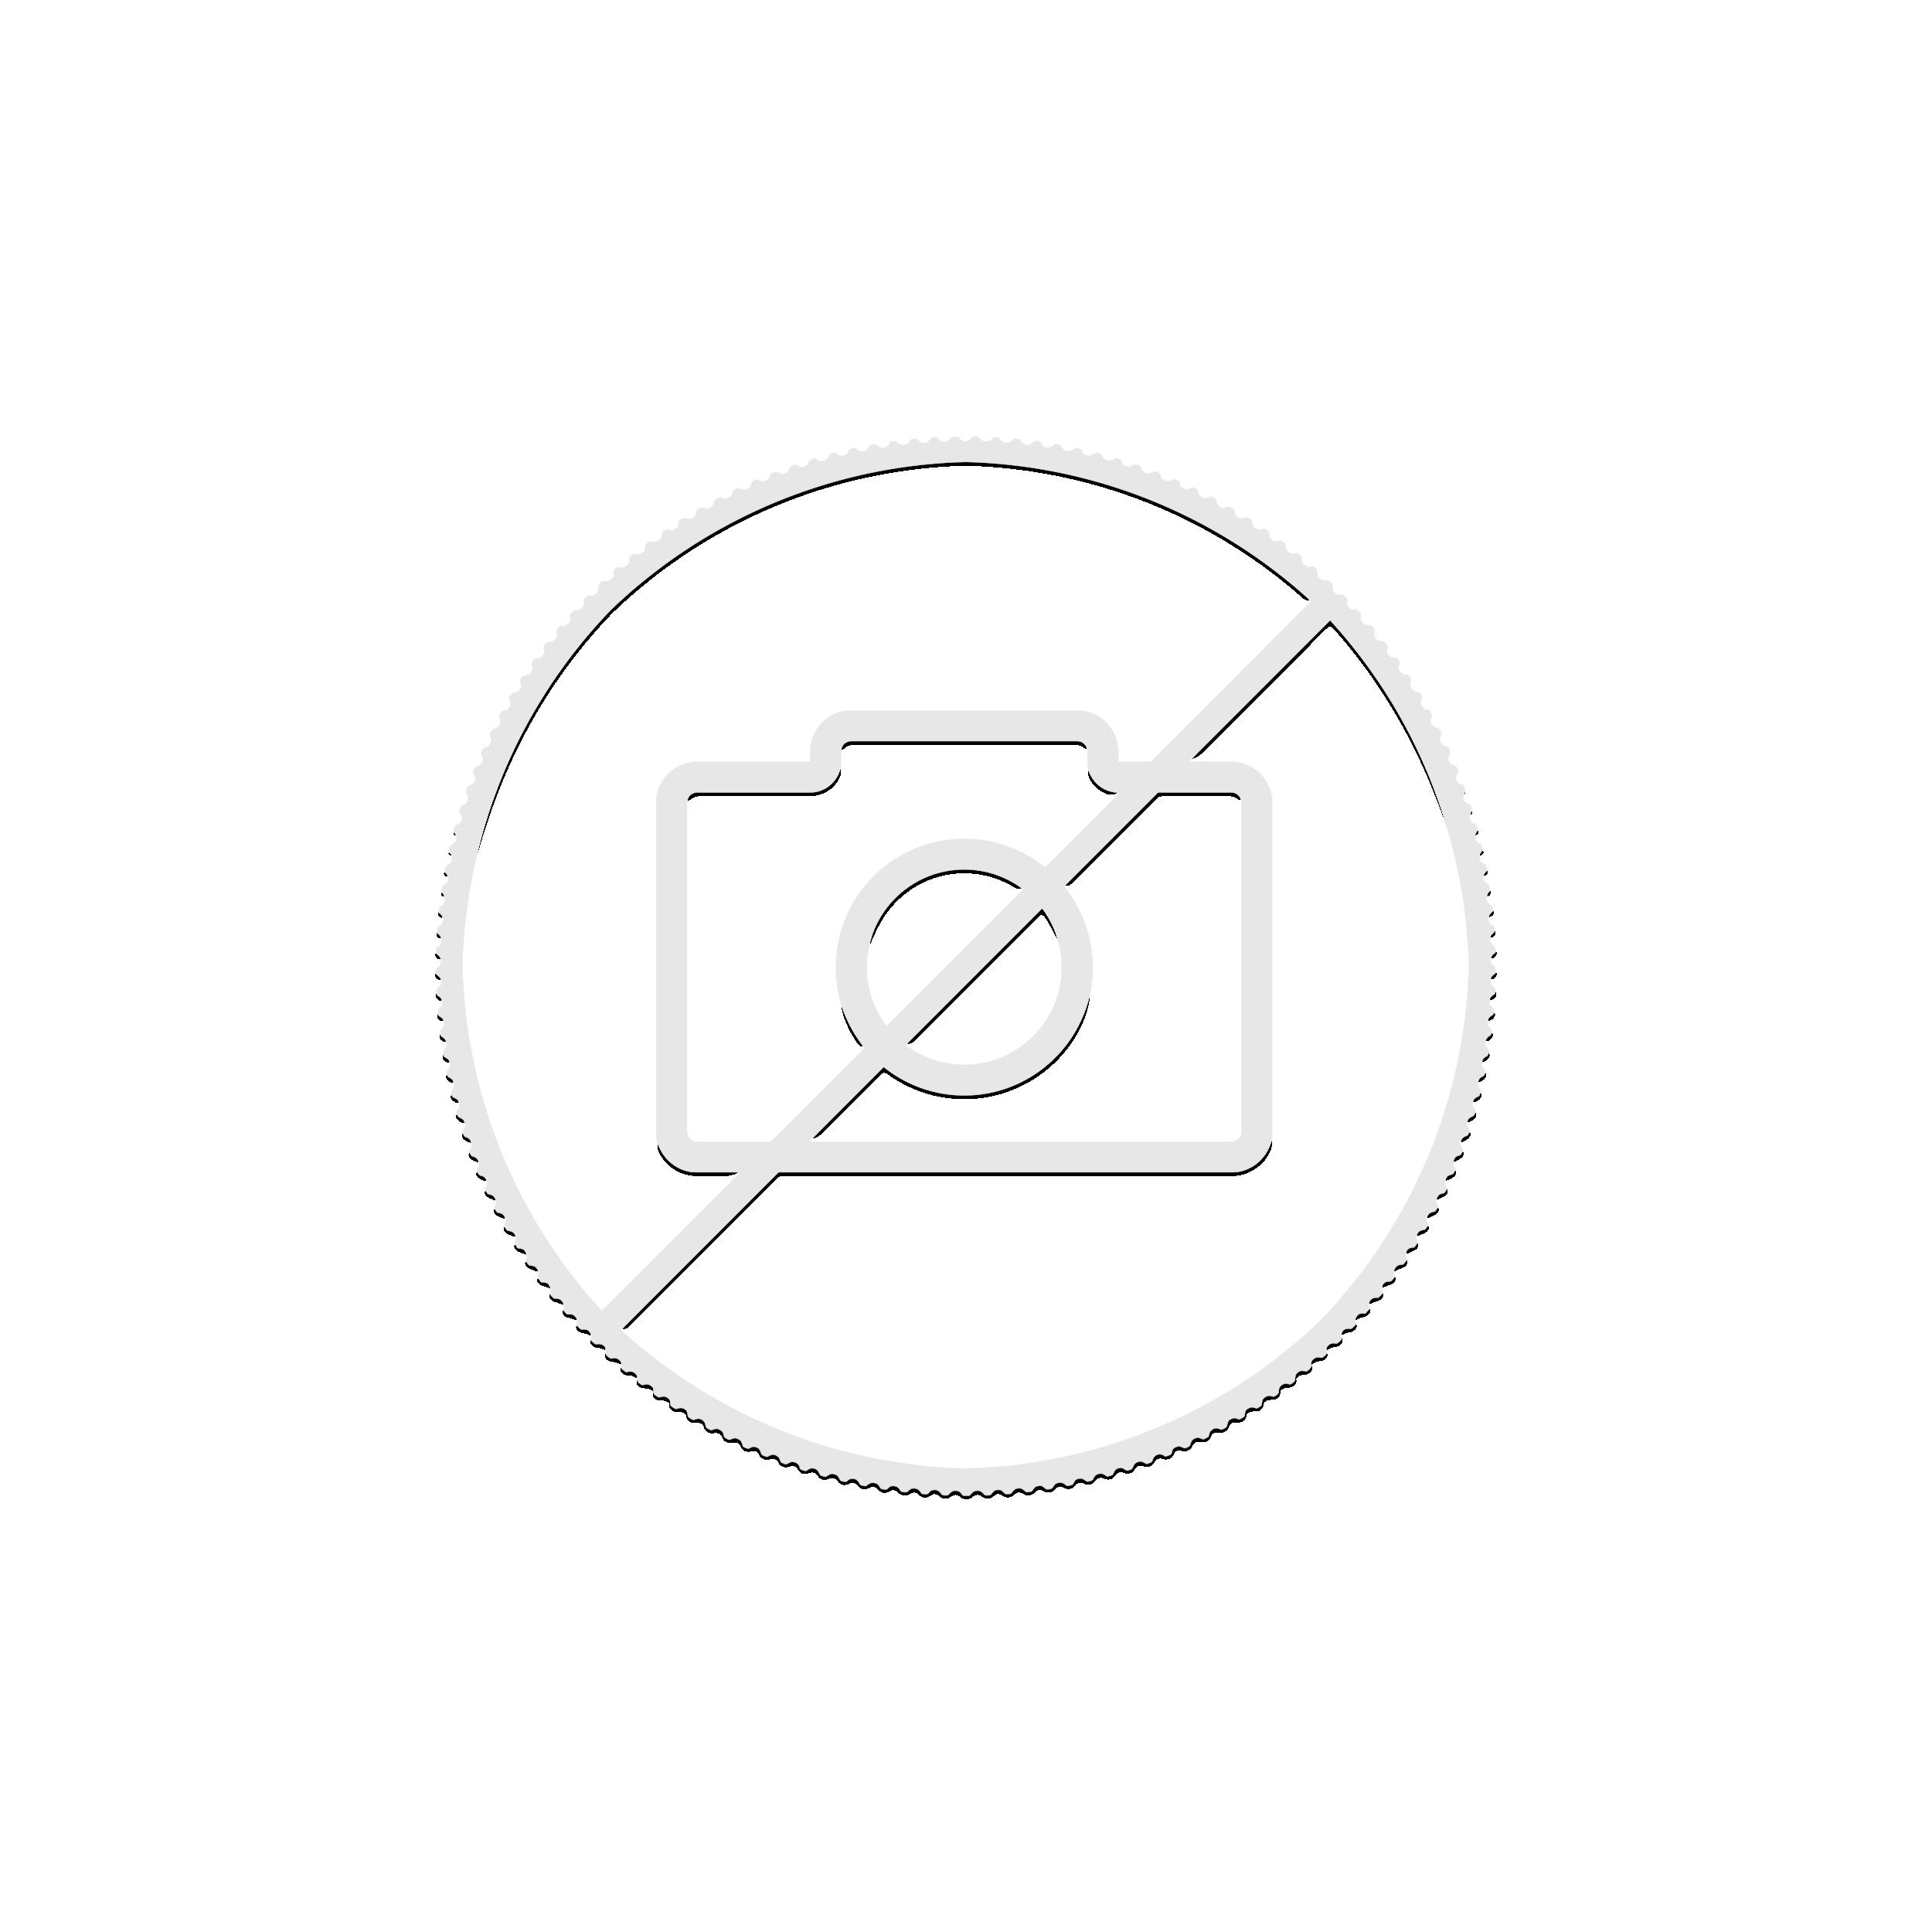 1 Troy ounce zilveren munt Philharmoniker 2016 Gold Plated